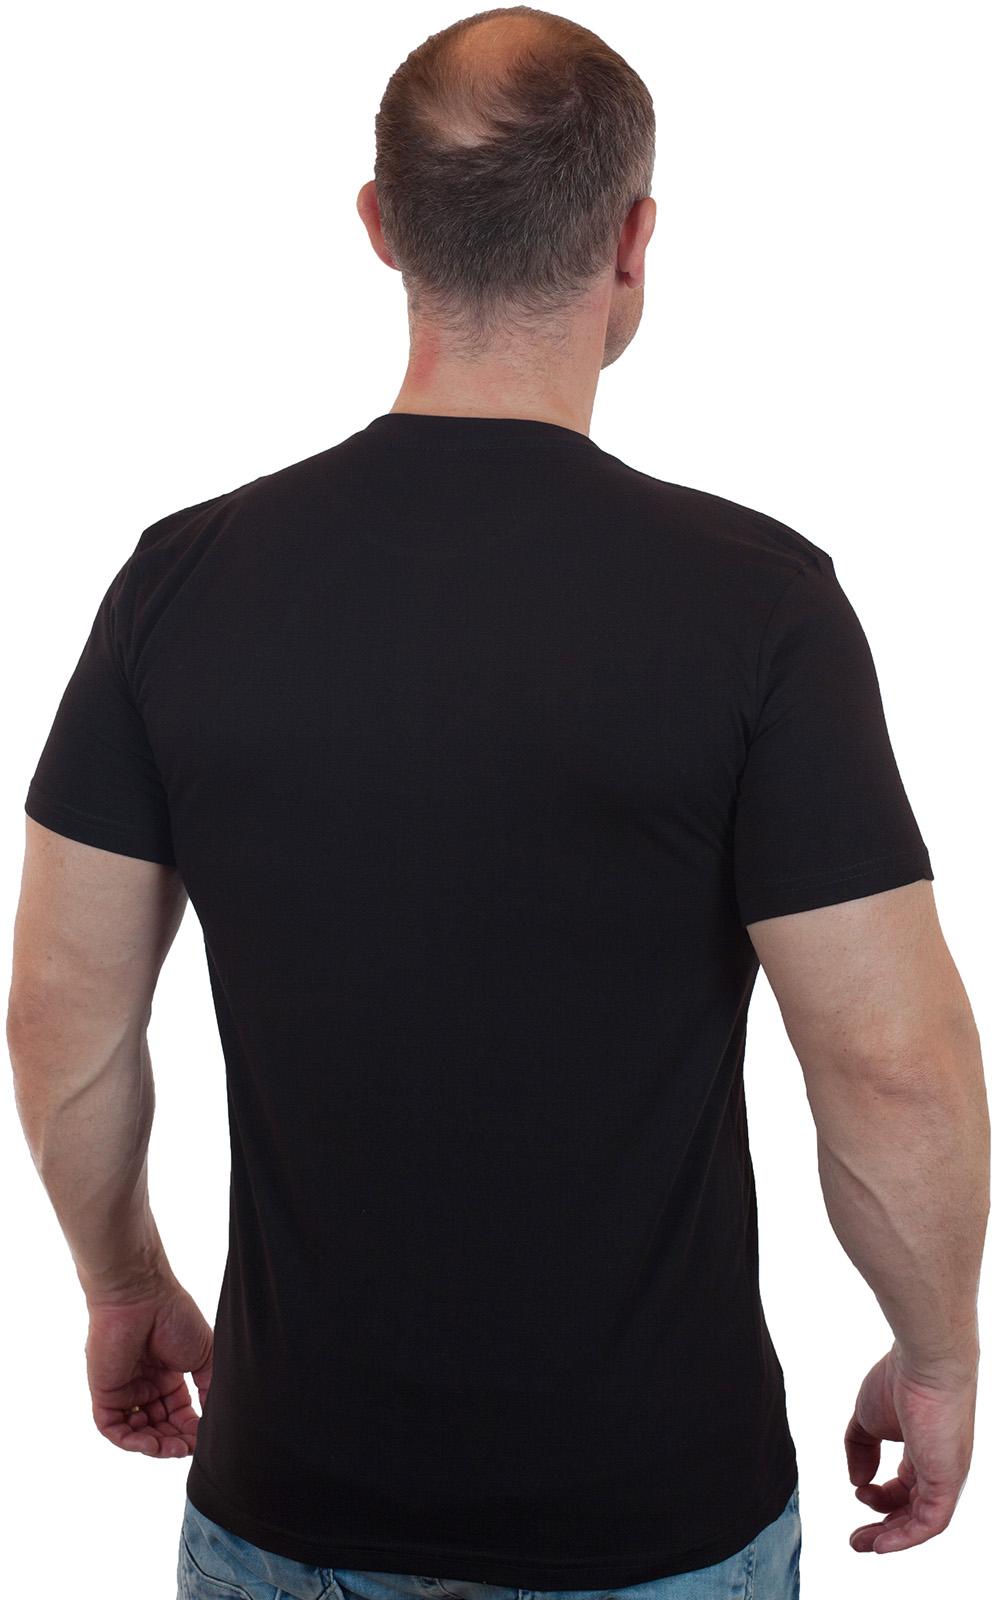 Крутая черная футболка морского пехотинца.